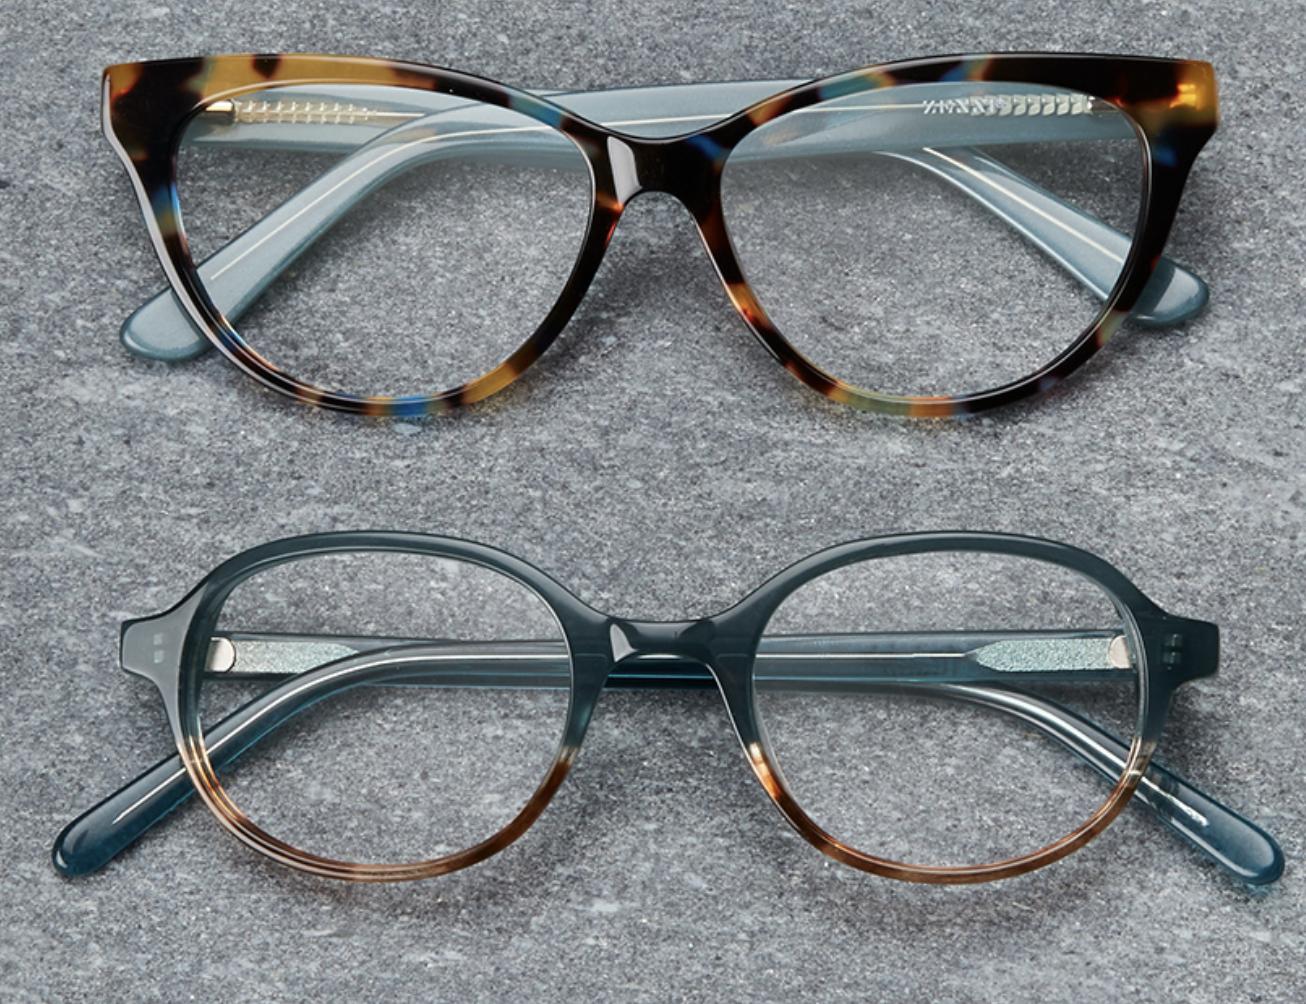 62cb6c5b96f Black Friday Deals on Prescription Eyeglasses! - Money Saving Mom ...